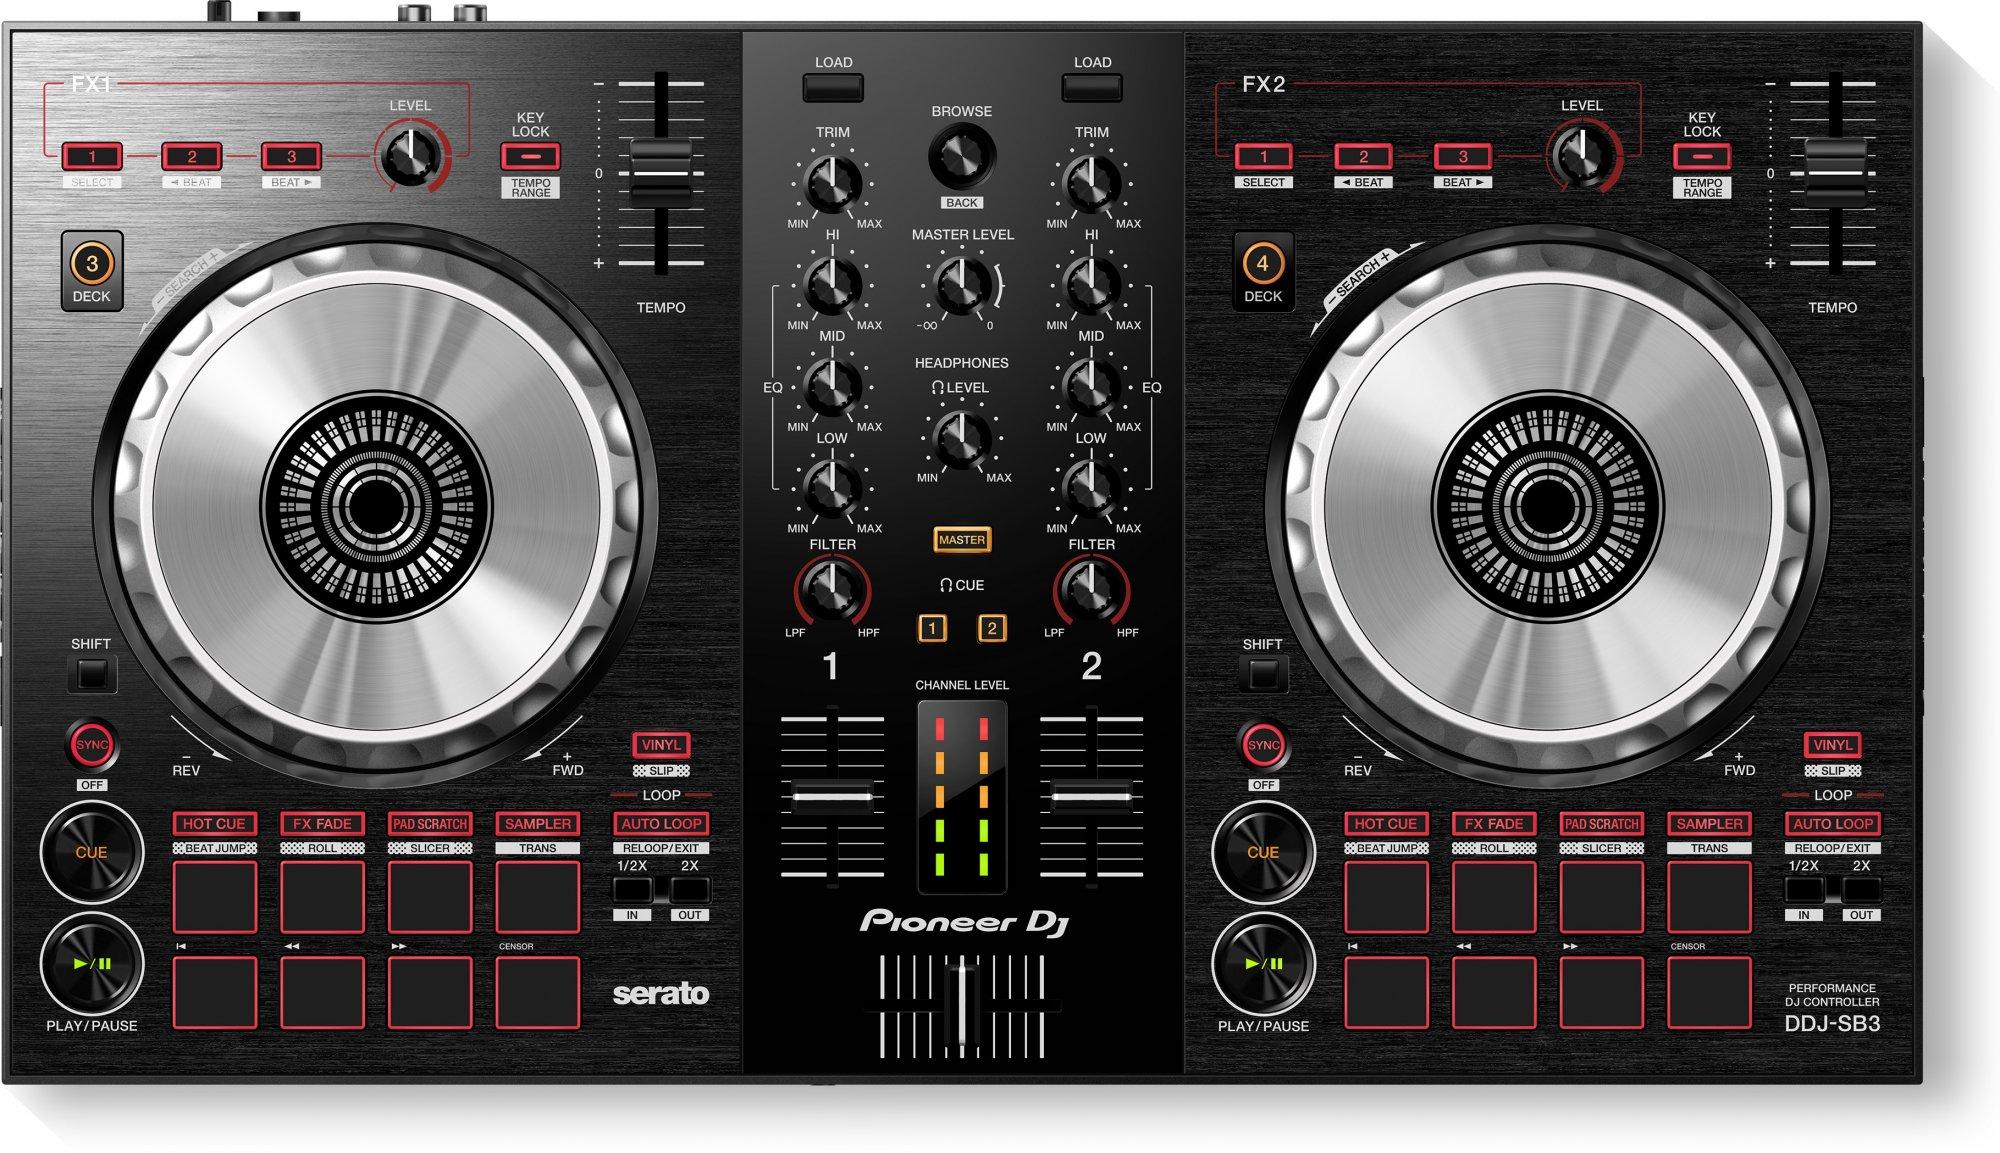 Pioneer DJ DDJ-SB3 Compact SERATO DJ CONTROLLER - 2 Channel